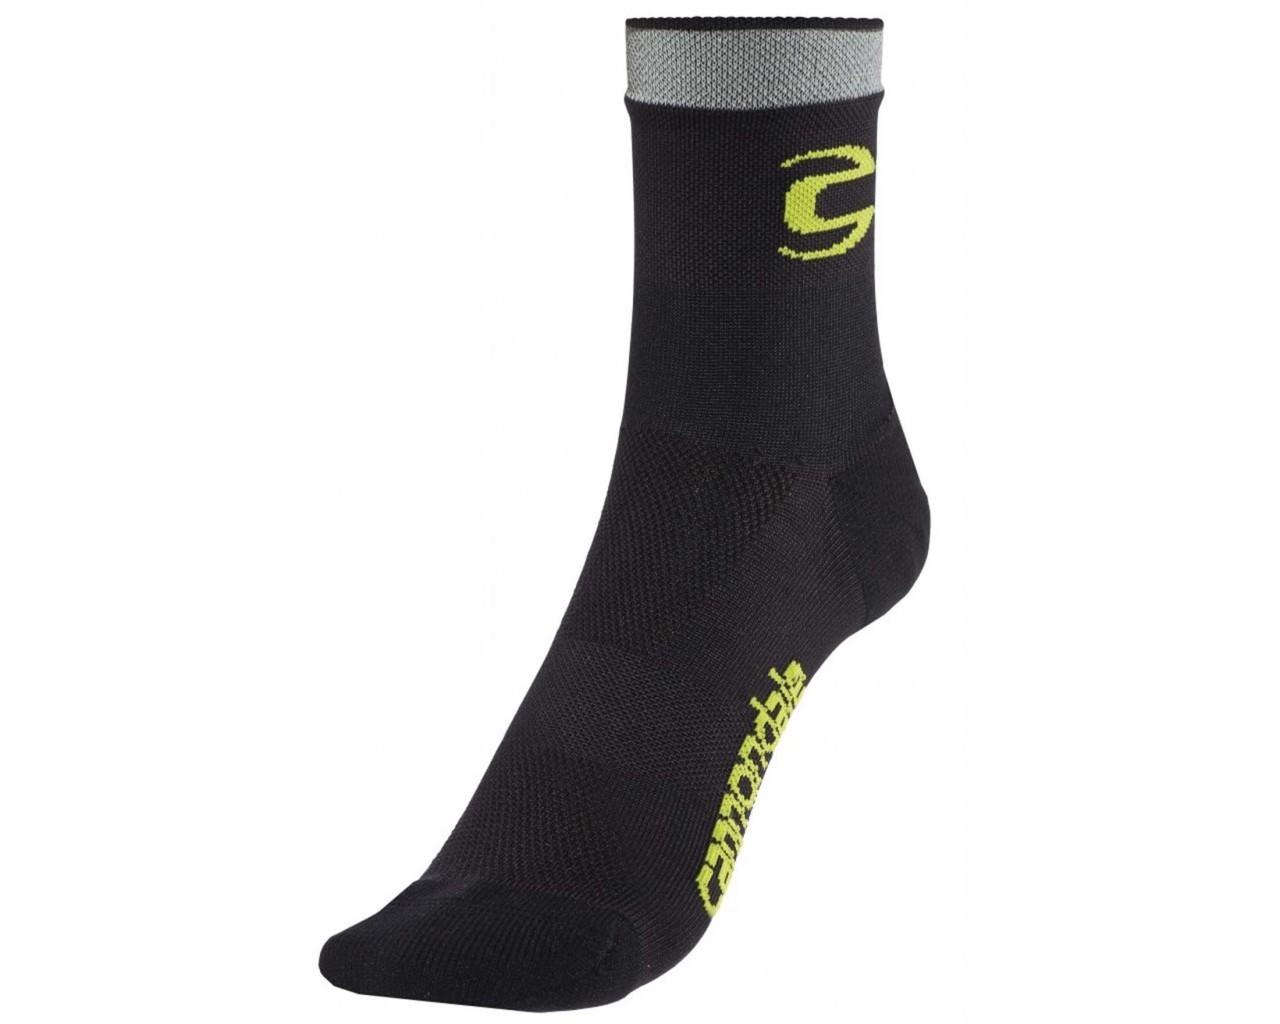 Cannondale Factory Racing CFR Team Socken   black